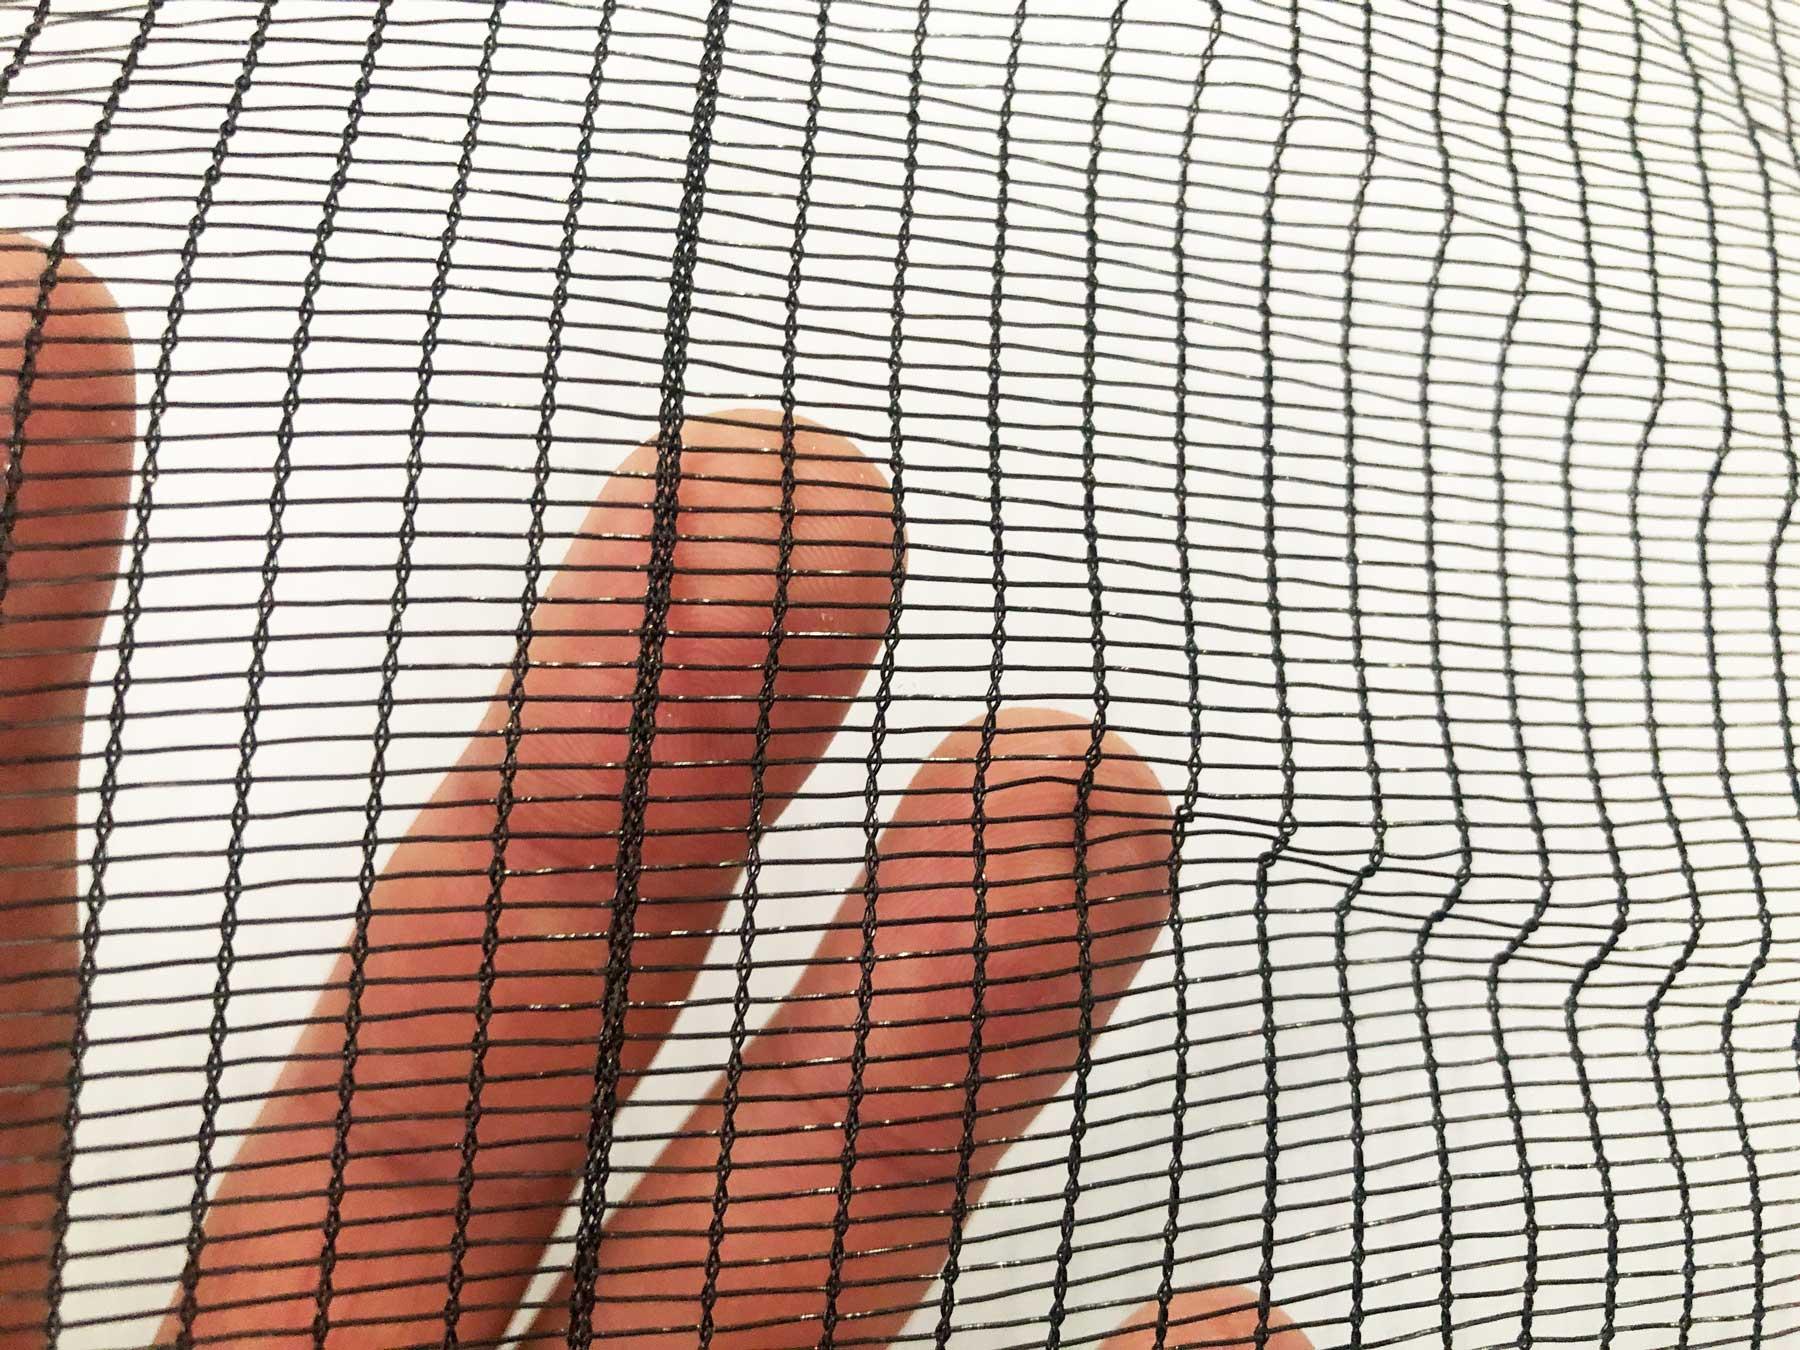 Tela Sombrite Nylon Monofilamento com Giro Inglês 50% 3x50